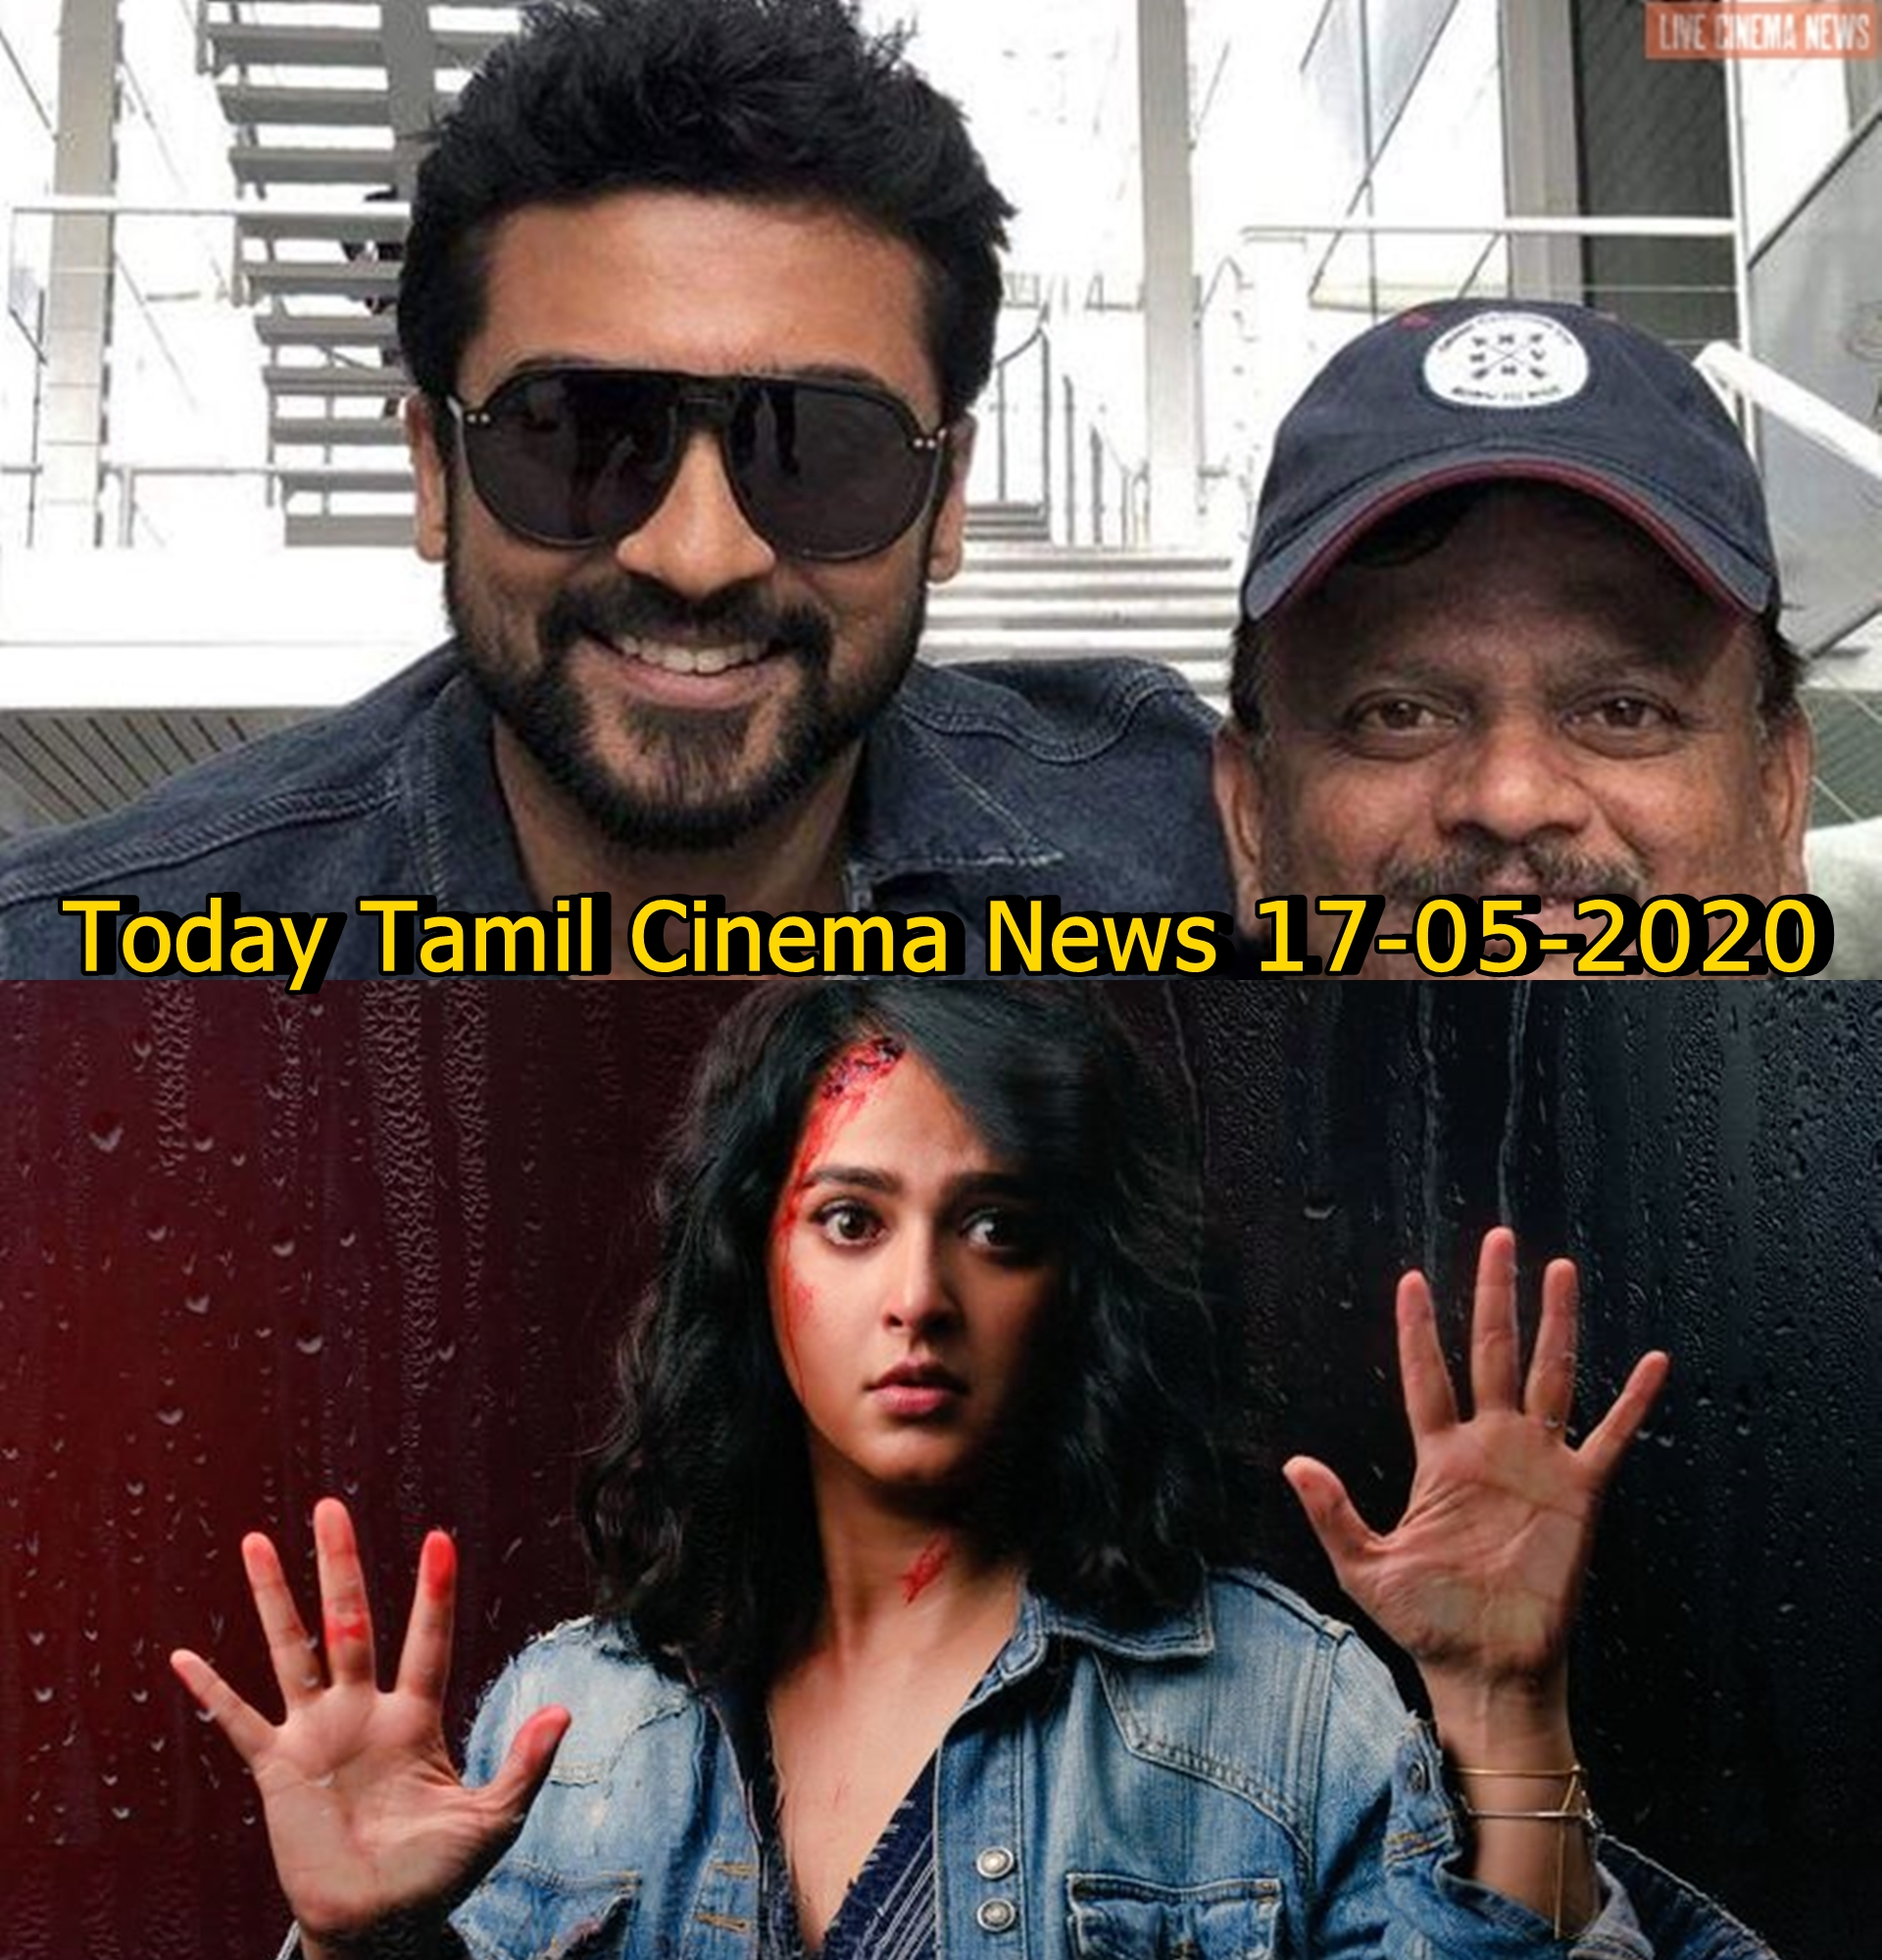 Today Tamil Cinema News 17-05-2020